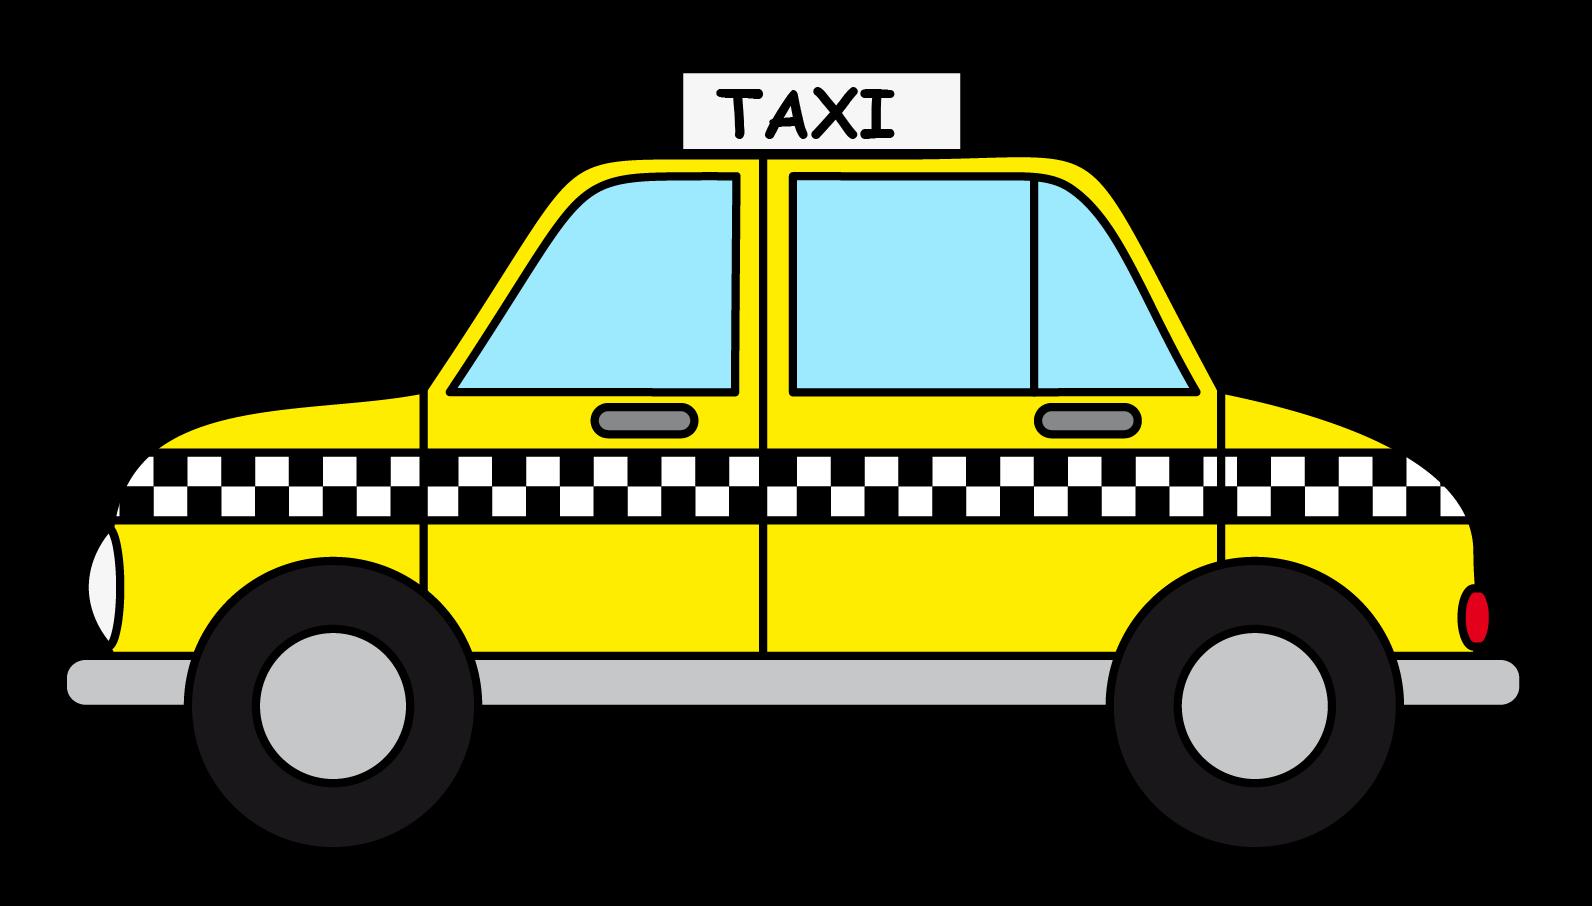 Taxi Cab Clip Art free image.